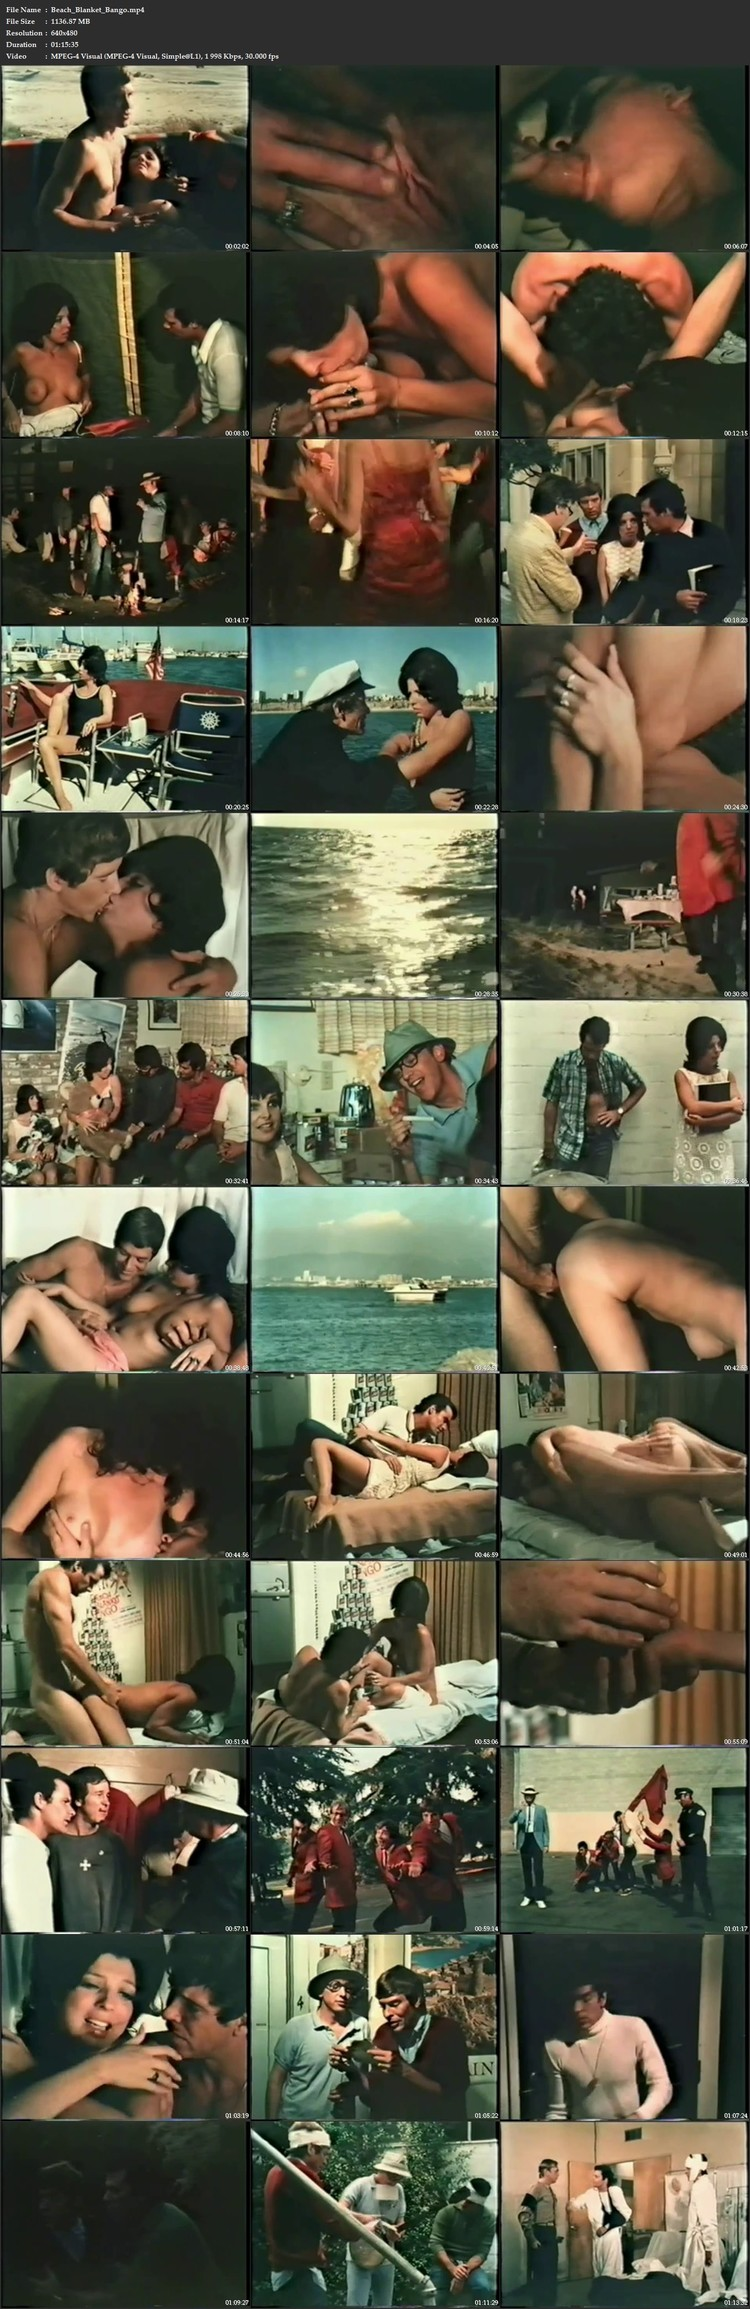 http://ist3-6.filesor.com/pimpandhost.com/1/_/_/_/1/4/i/t/i/4itik/Beach_Blanket_Bango.mp4_l.jpg